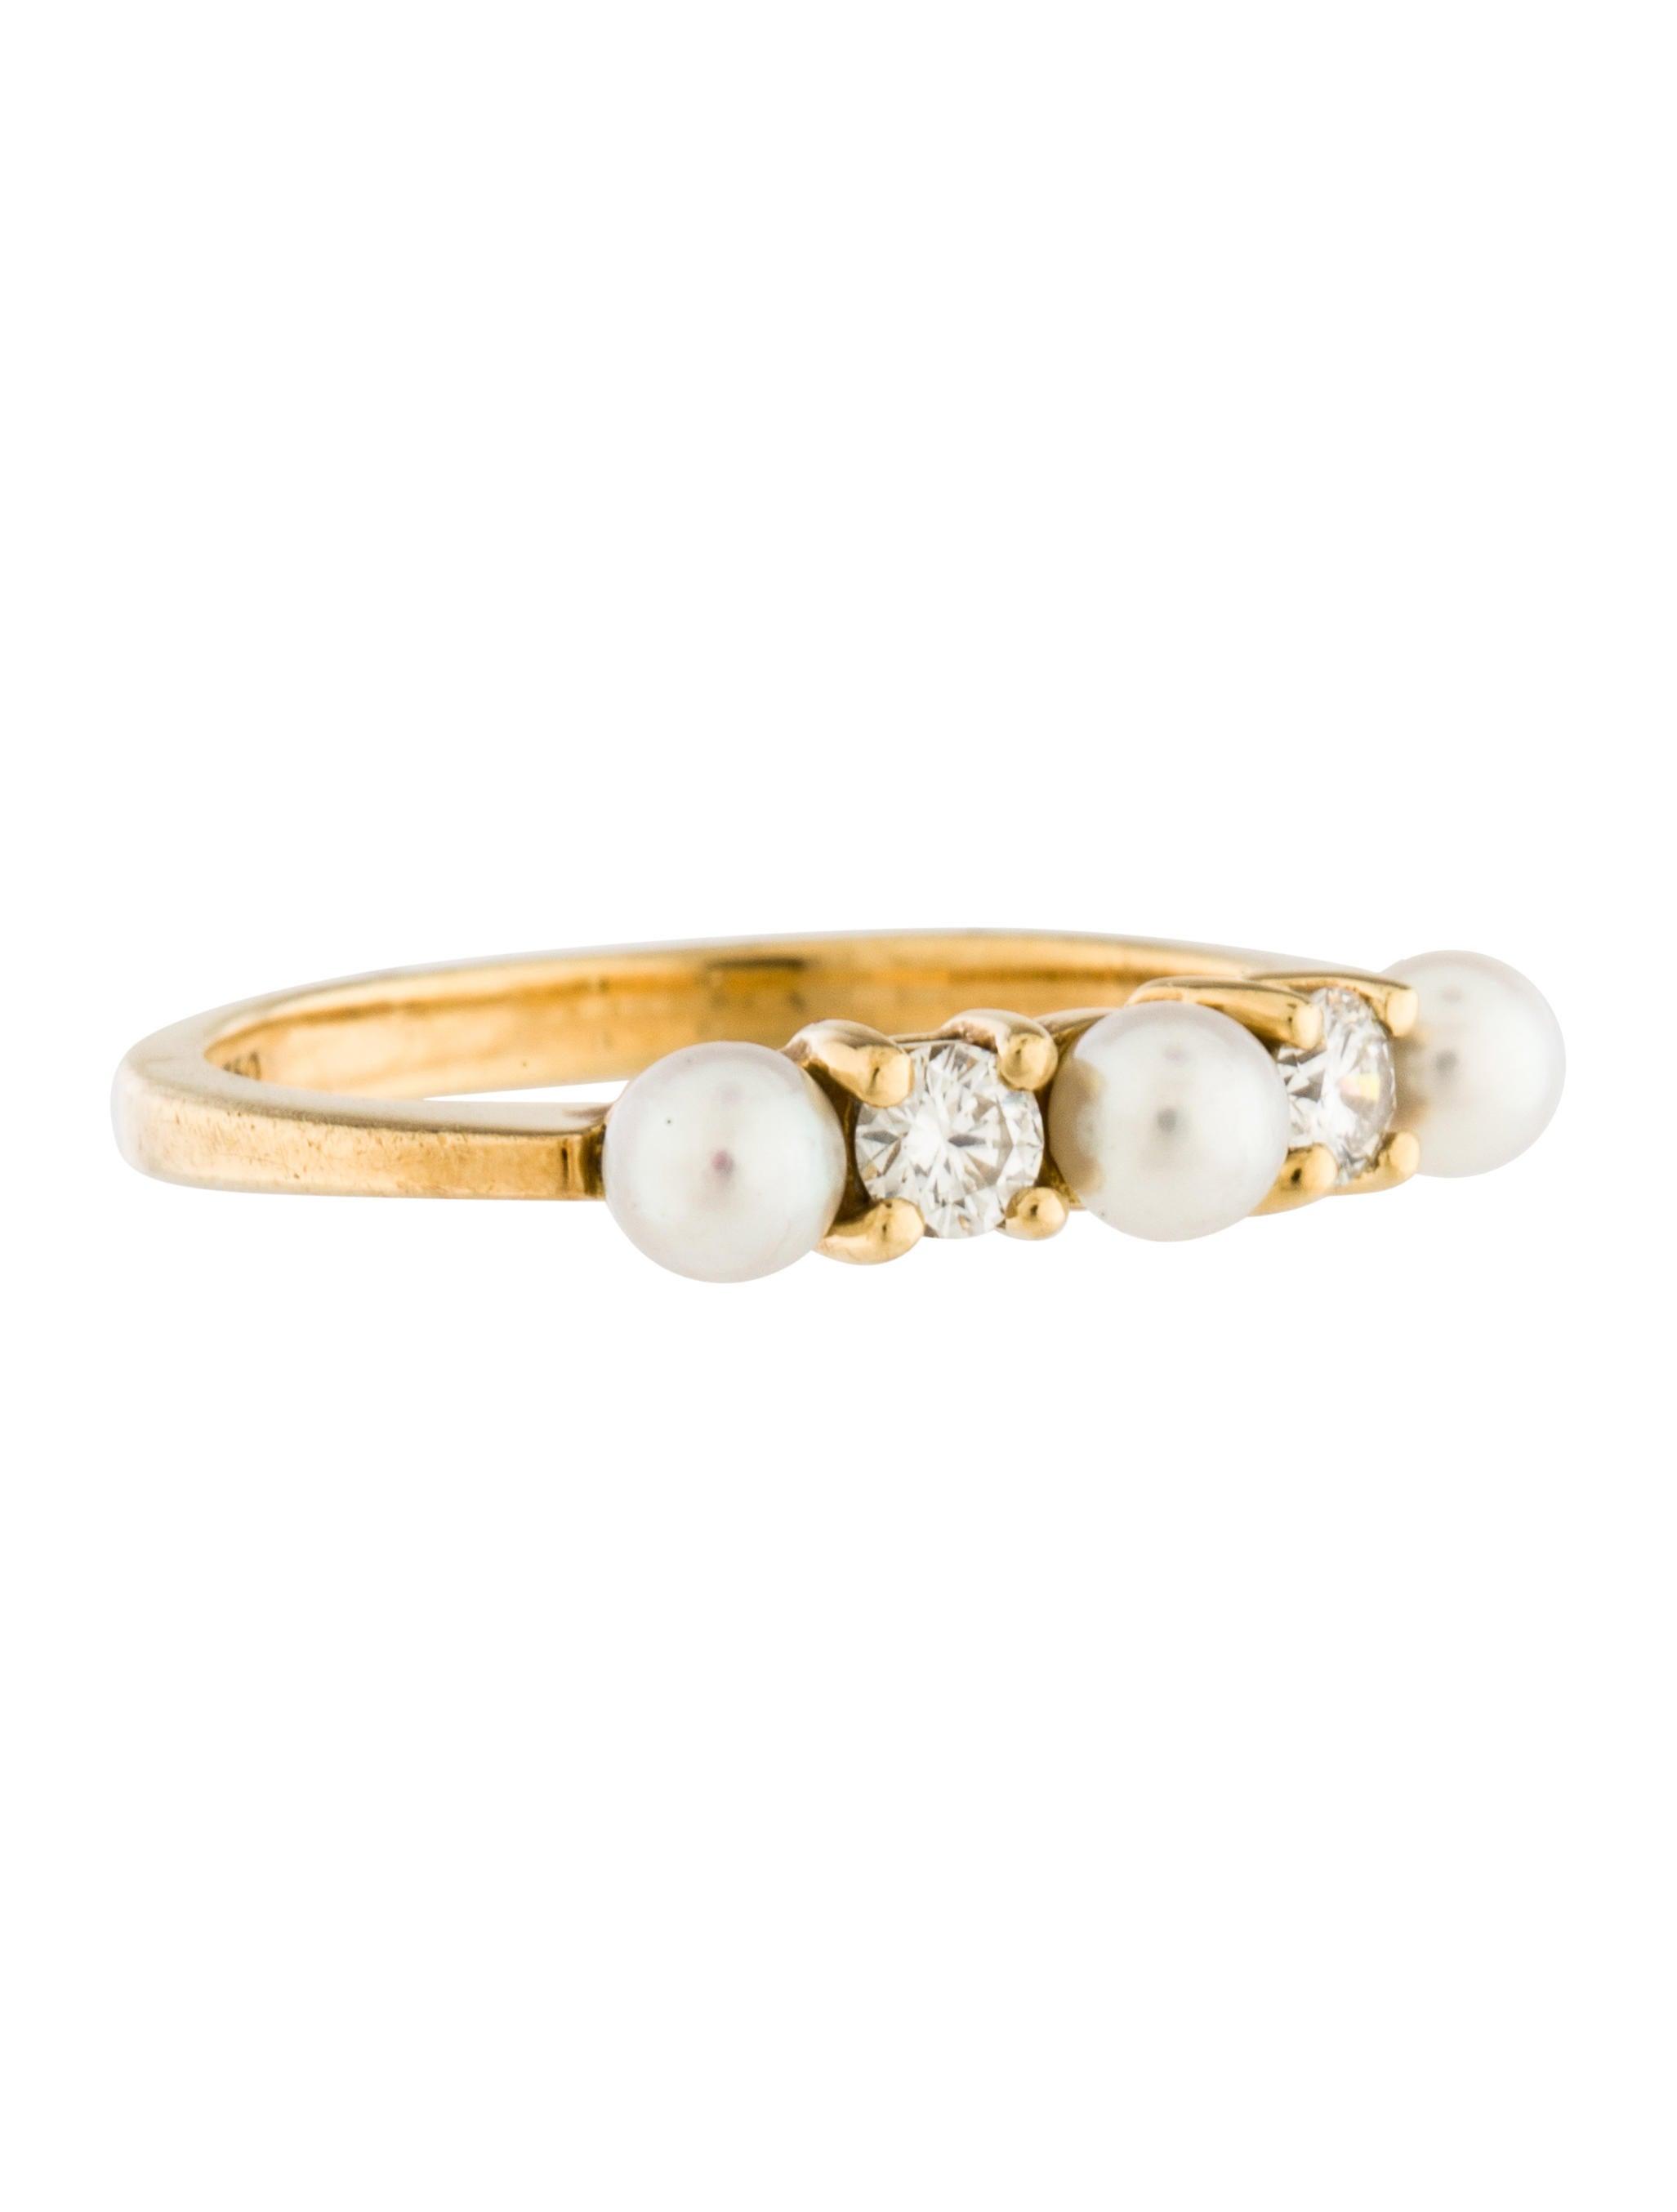 tiffany co pearl diamond band ring rings tif47729. Black Bedroom Furniture Sets. Home Design Ideas